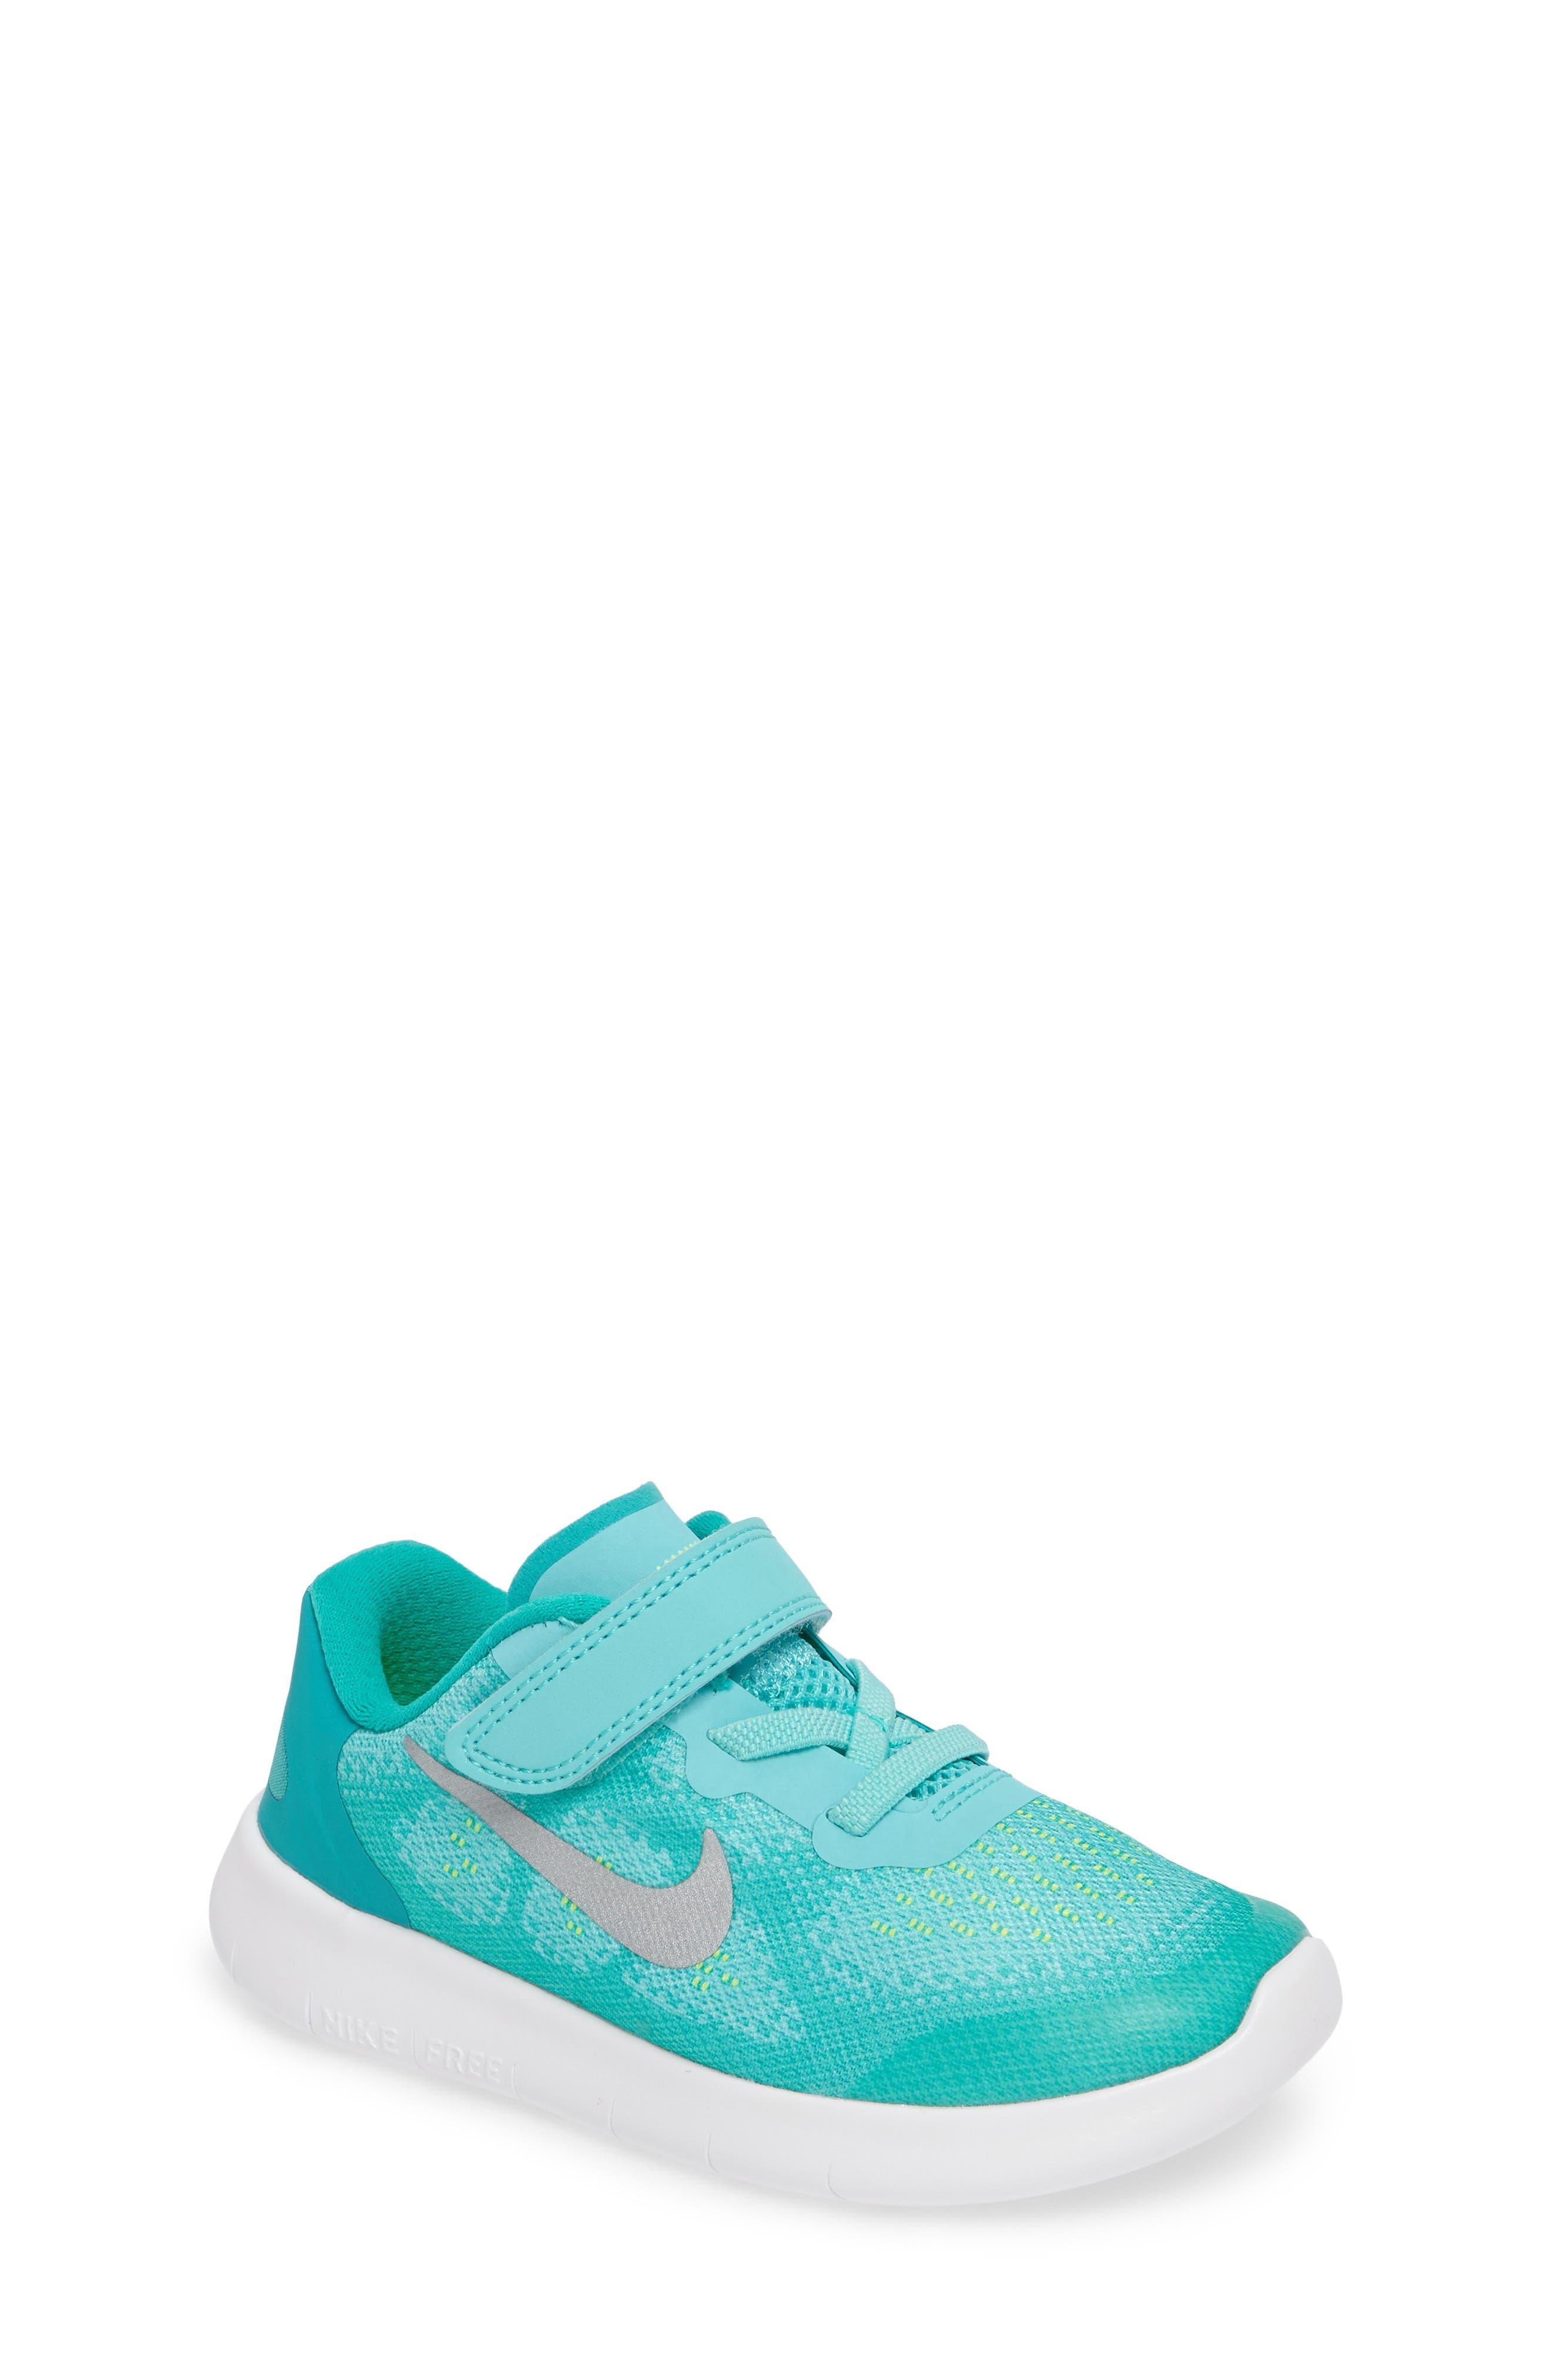 Free Run 2017 Sneaker,                             Main thumbnail 3, color,